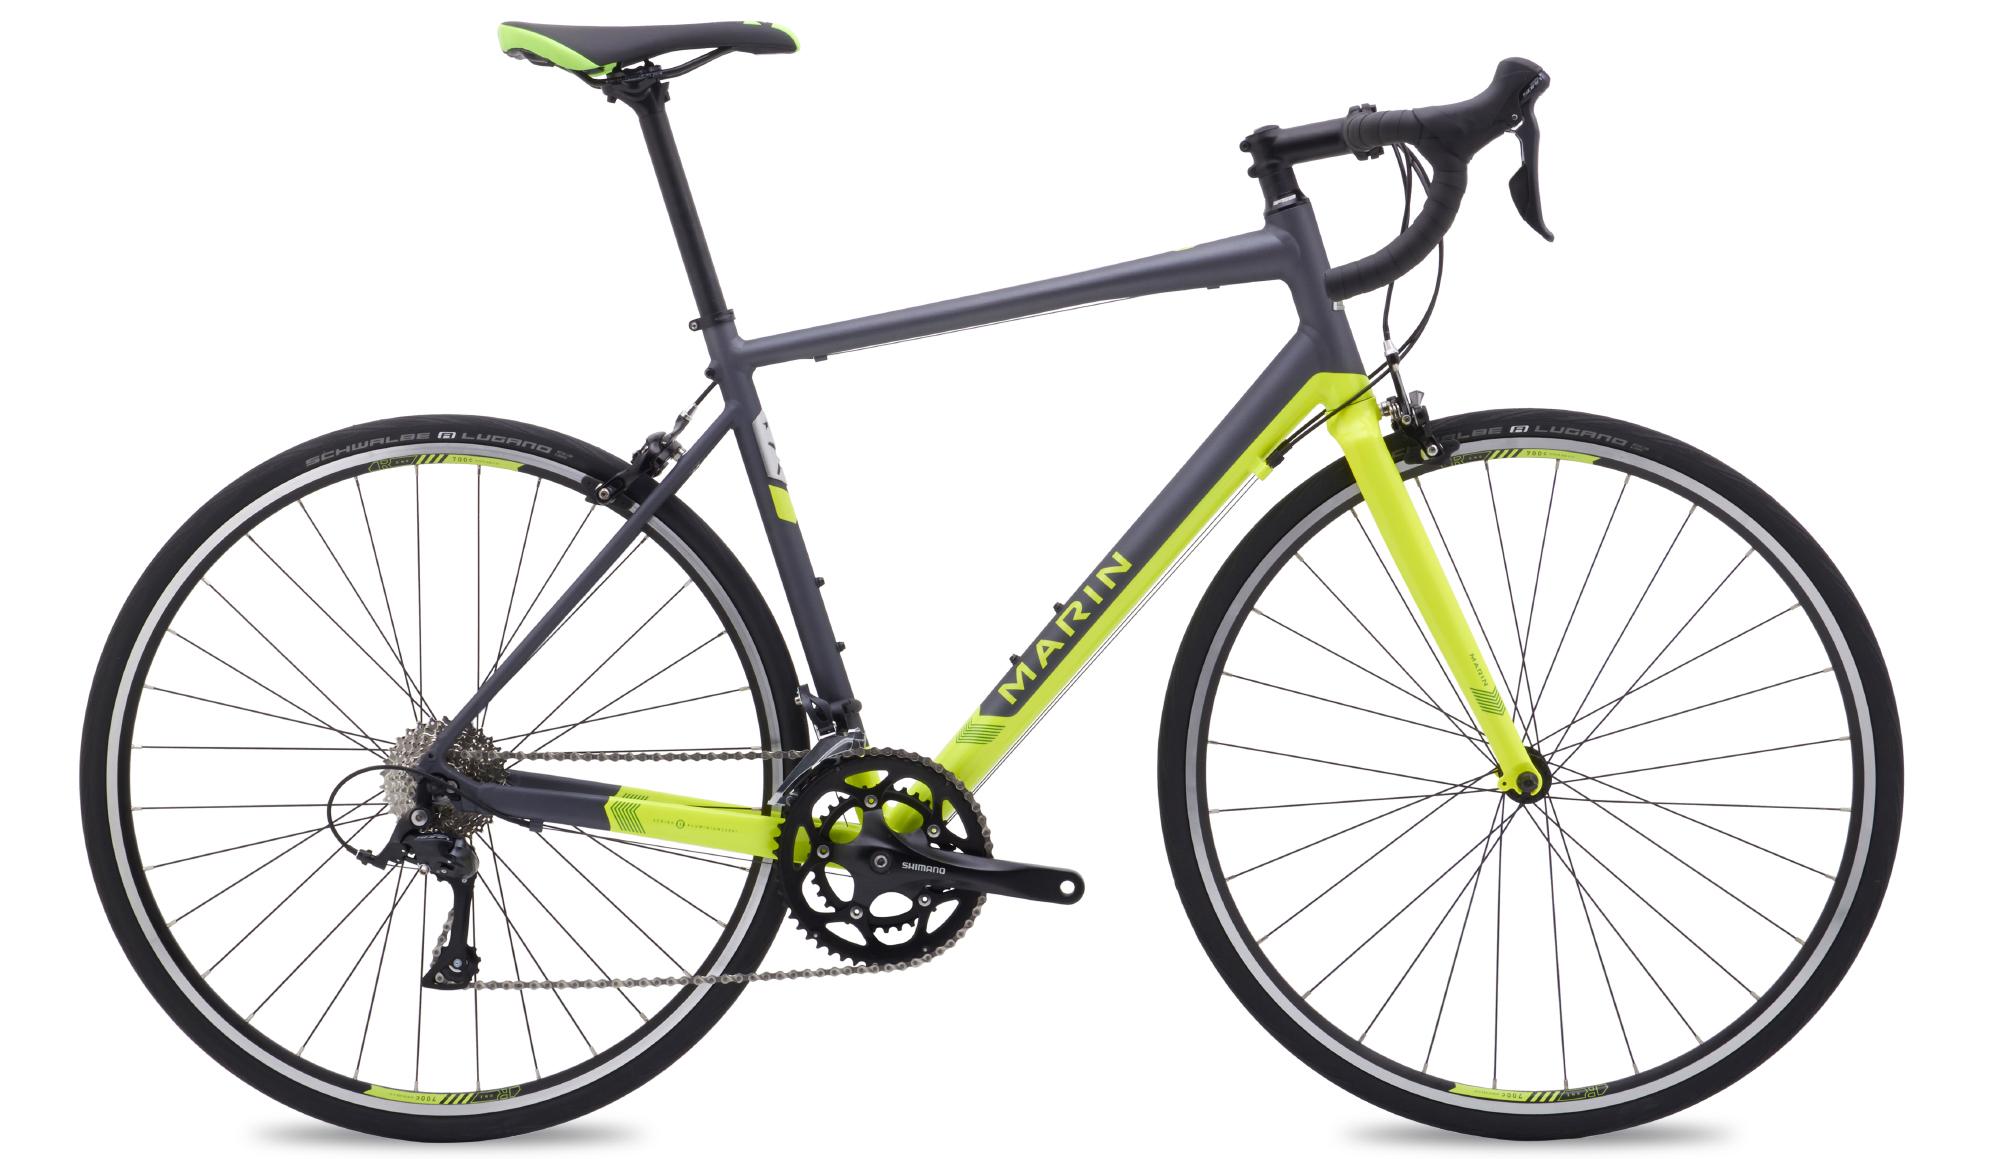 Marin Argenta Comp - Enduro racercykel - Matgrå/HiVis grøn   Road bikes